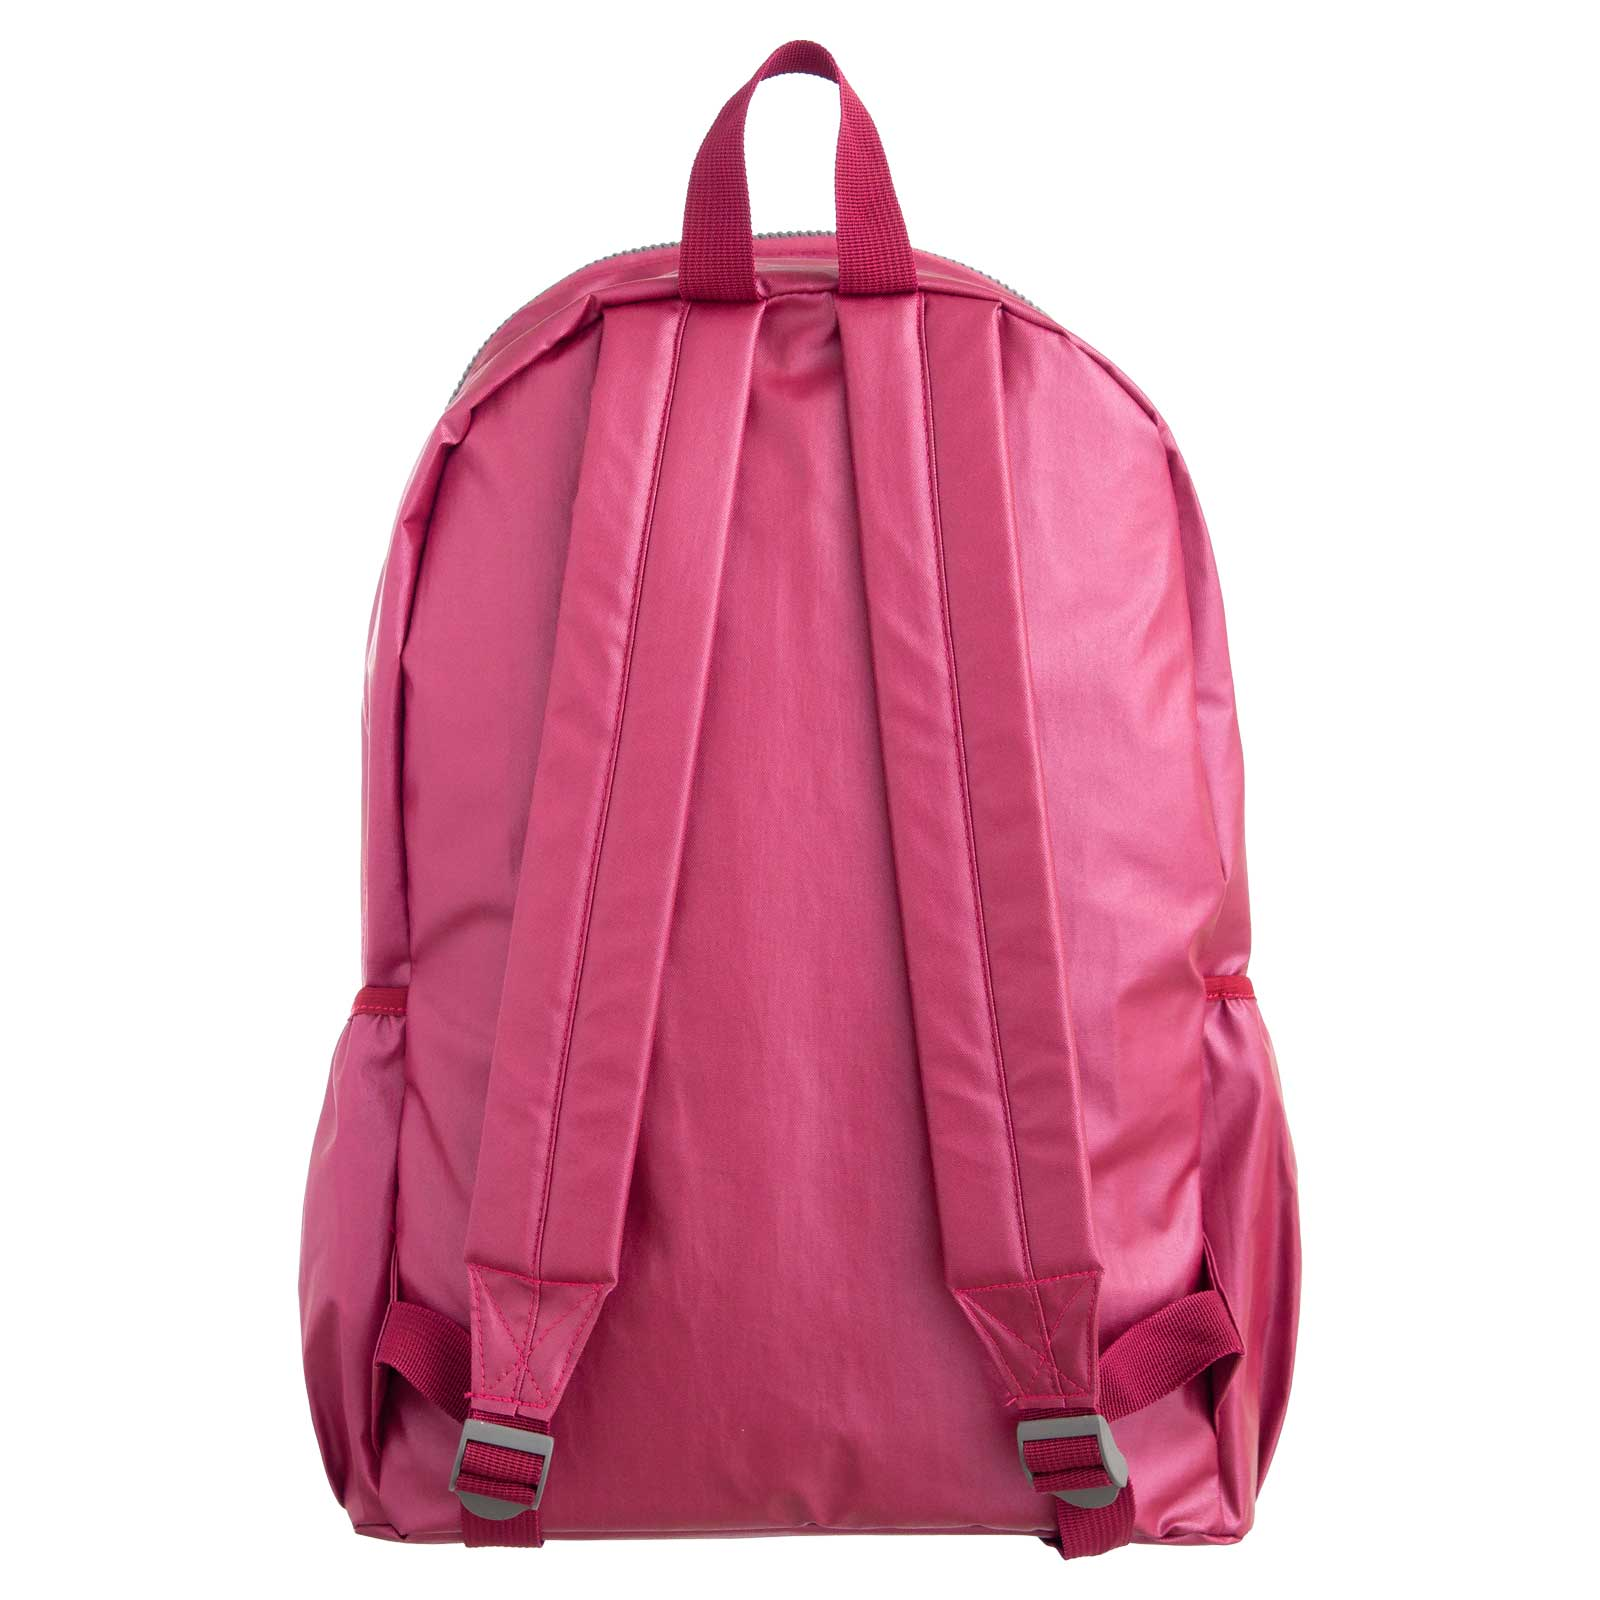 Mochila escolar metalizada rosa YS41016 Convoy